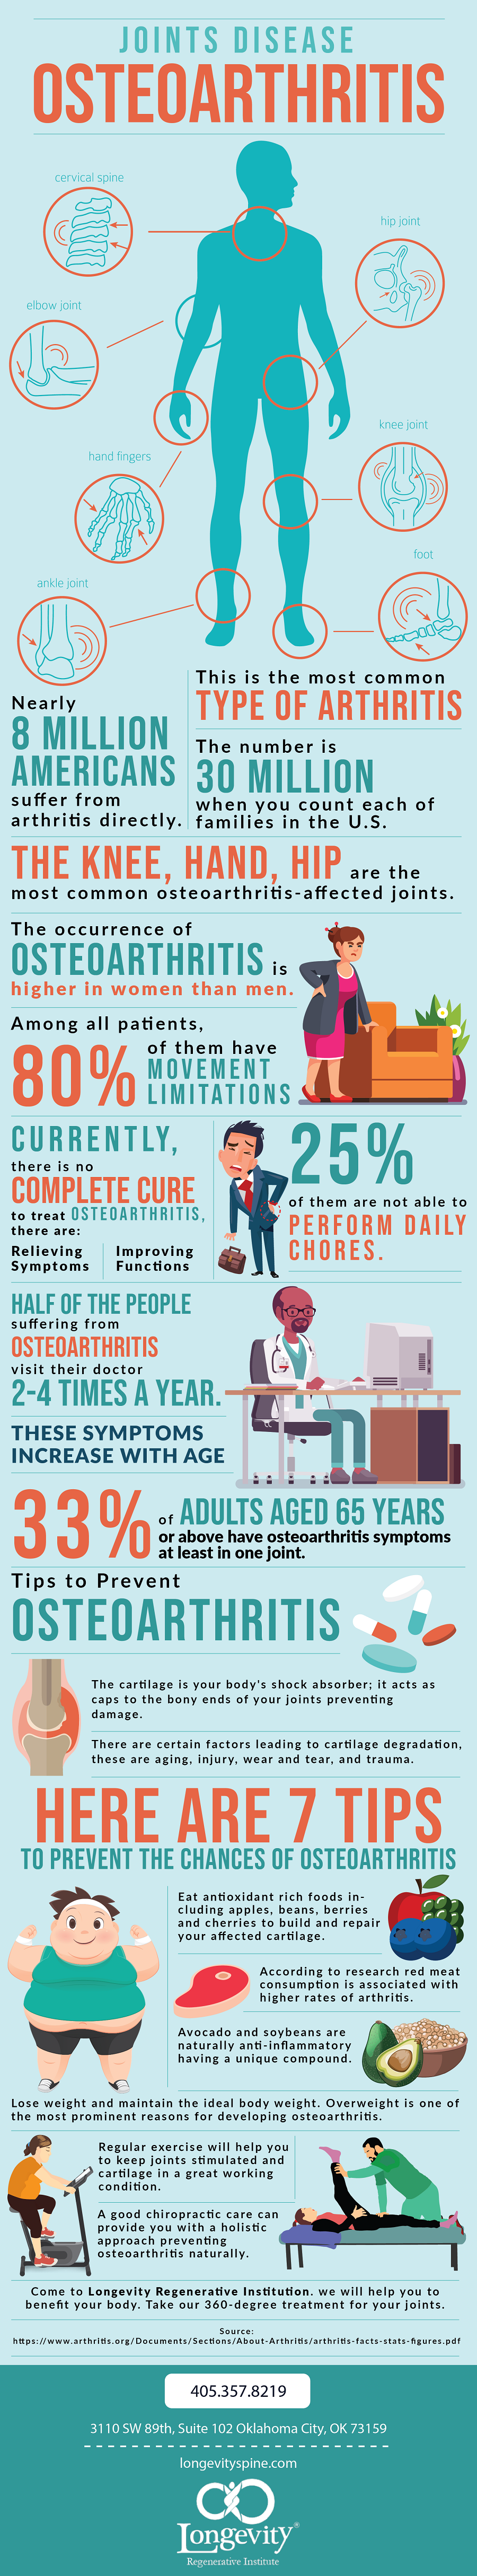 Joint Disease - Osteoarthritis.png